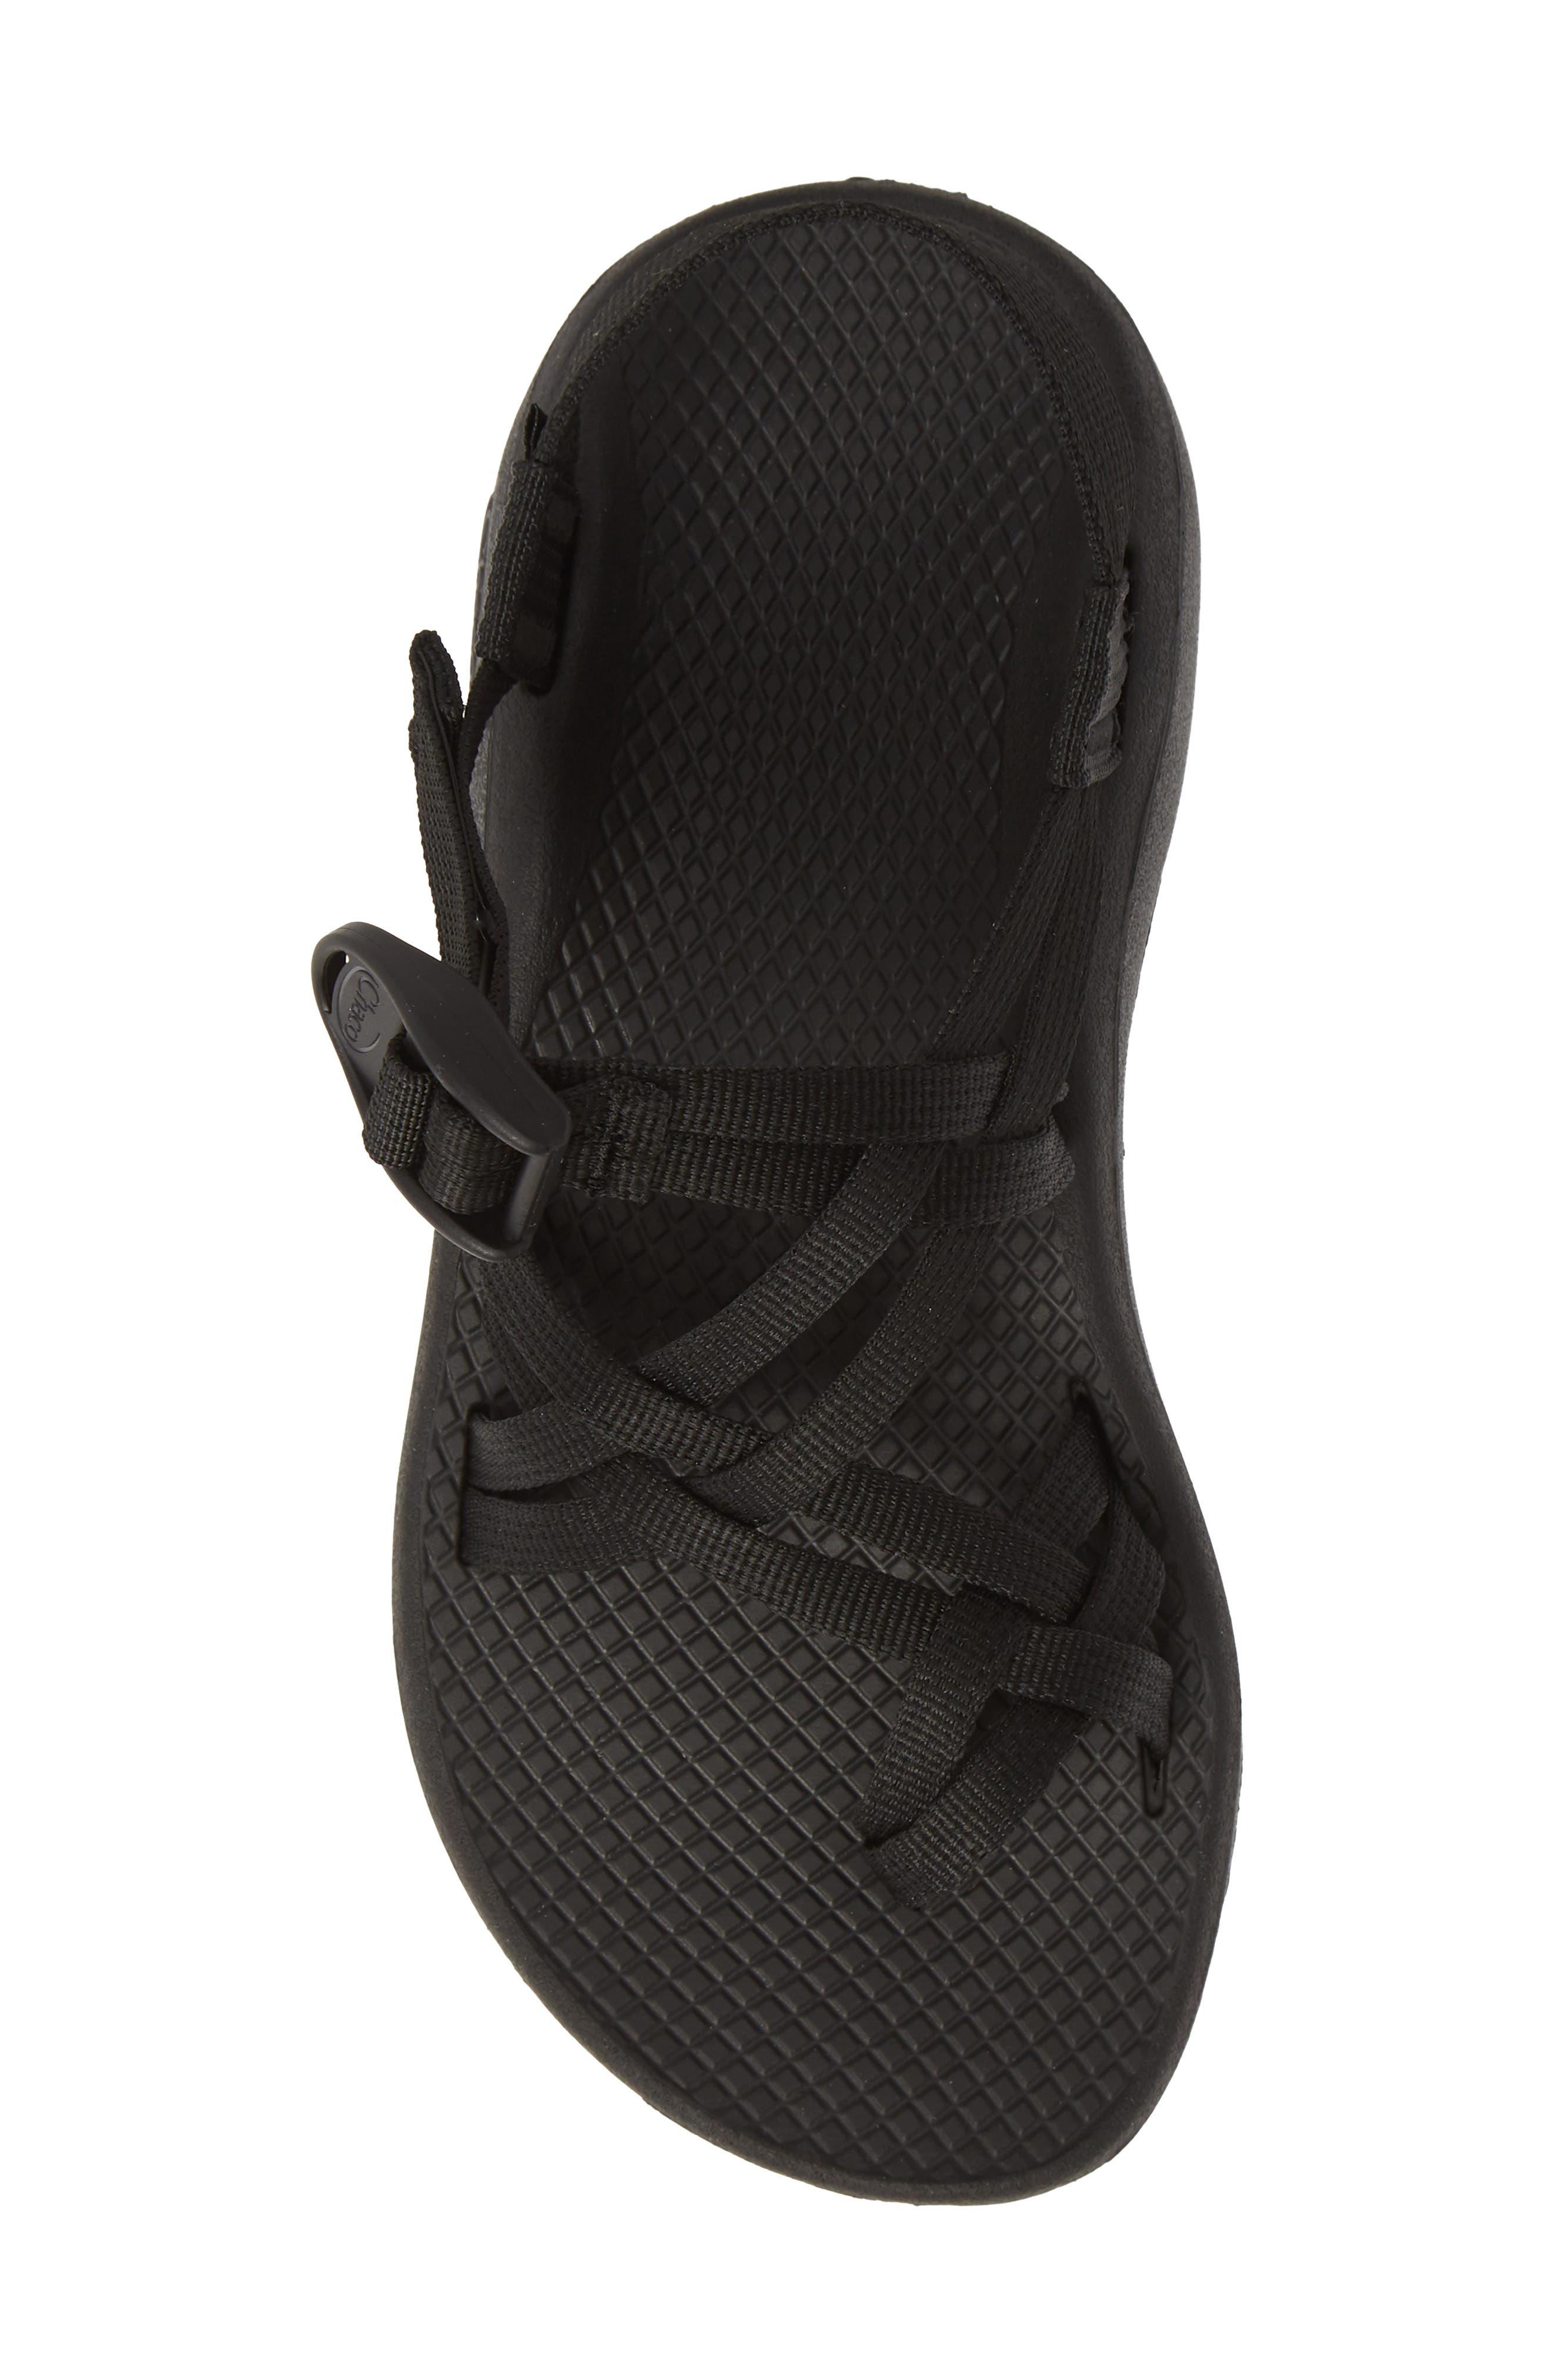 CHACO,                             Z/Cloud X2 Sandal,                             Alternate thumbnail 5, color,                             SOLID BLACK FABRIC